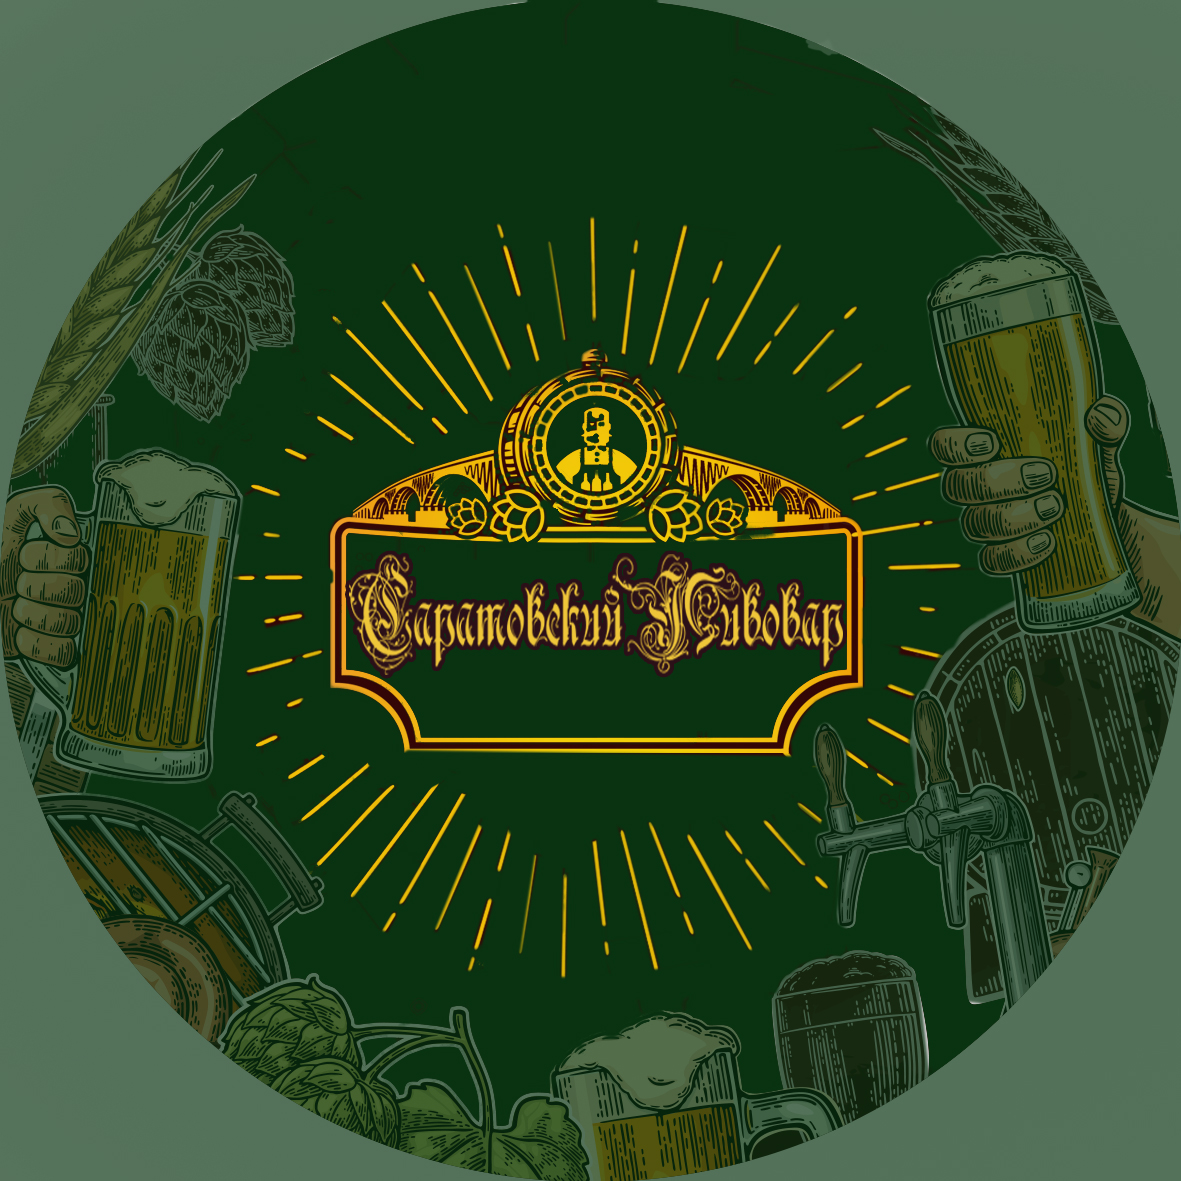 Разработка логотипа для частной пивоварни фото f_1975d7610e90959c.jpg